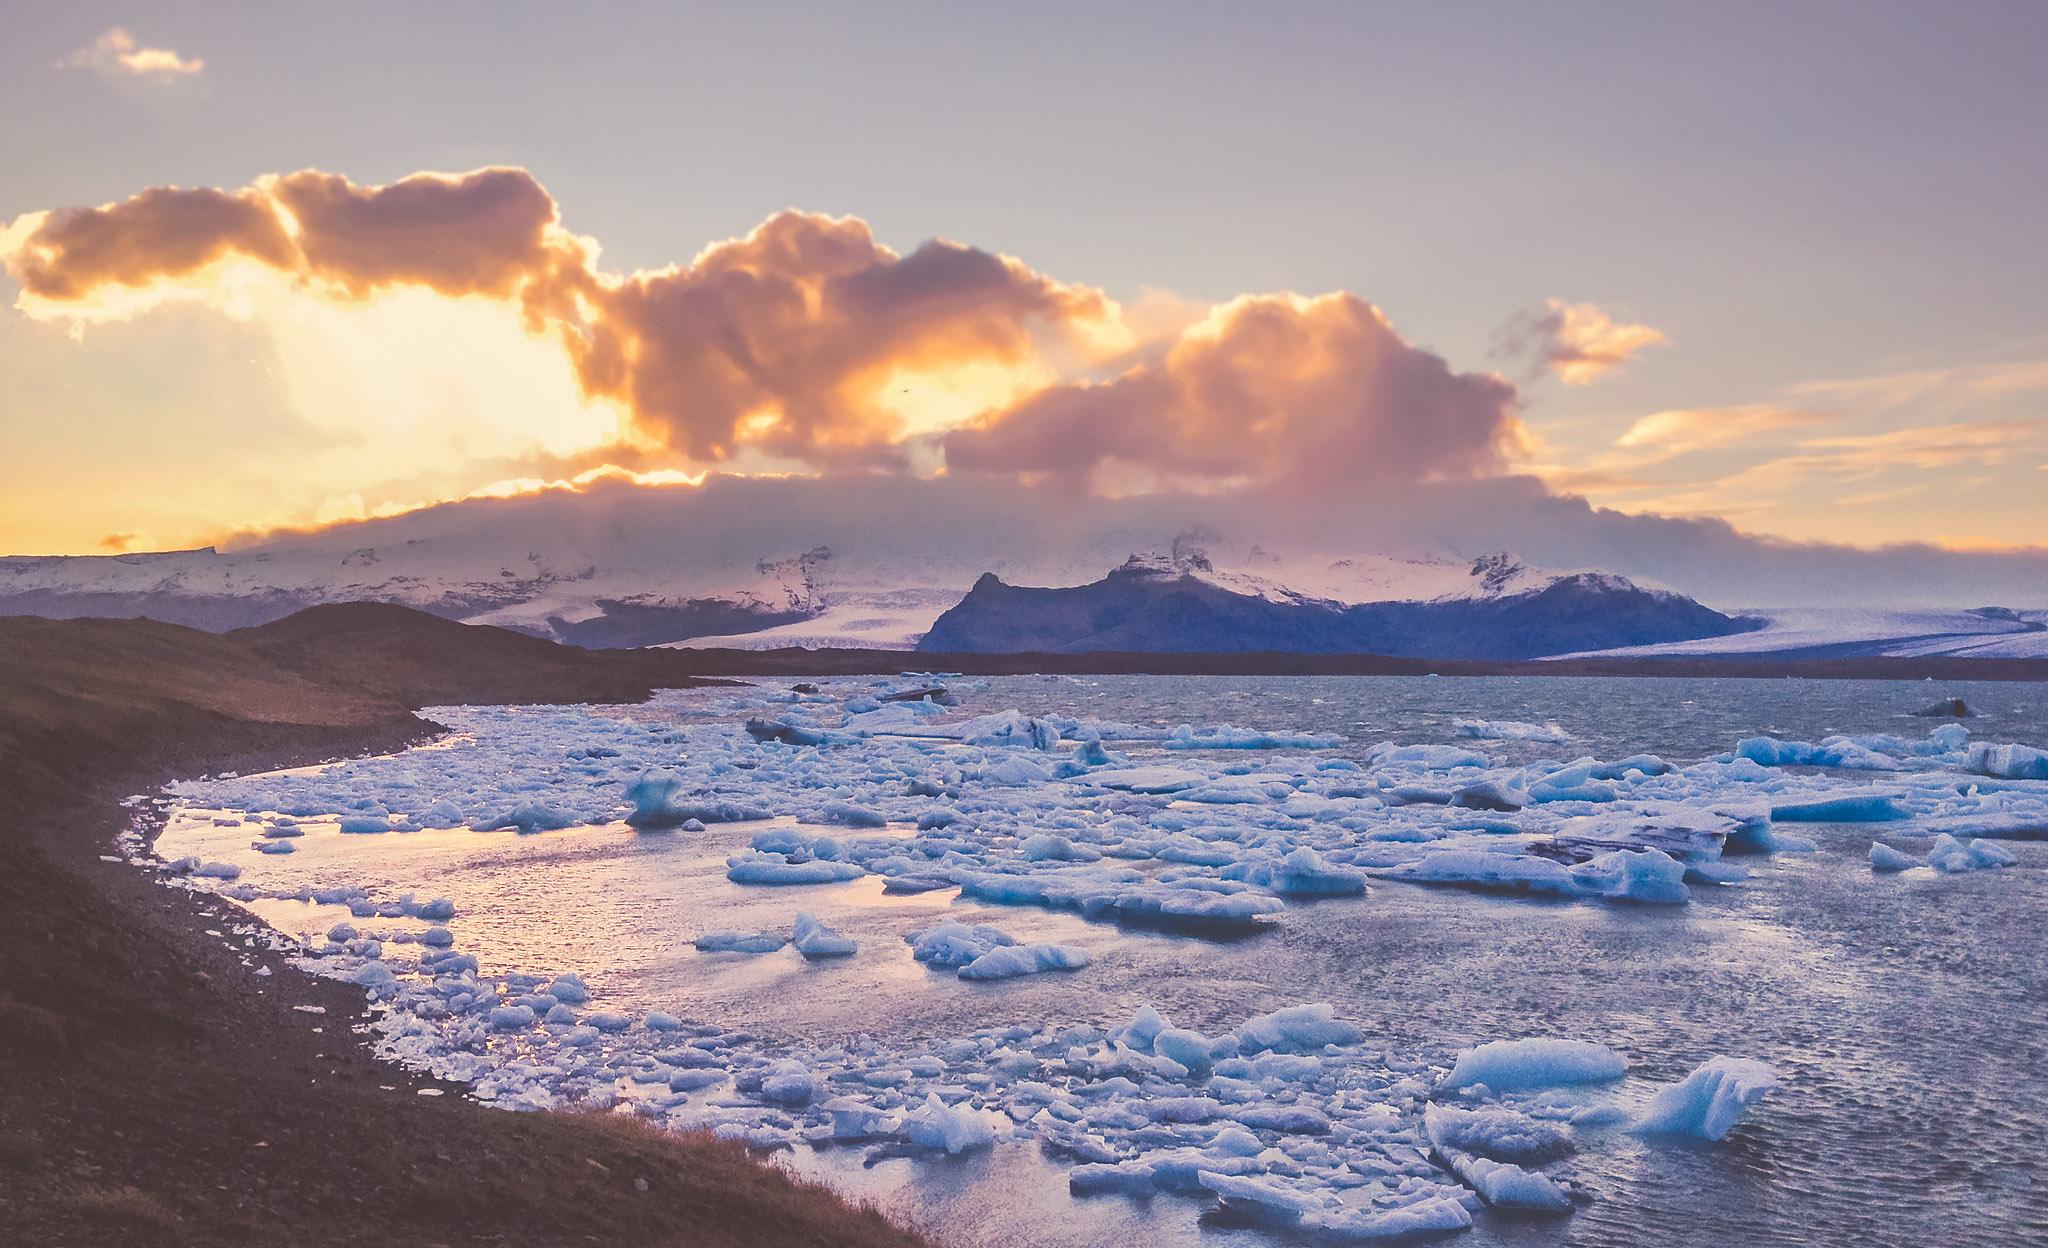 ICELAND-IPHONE-WEB-01.jpg